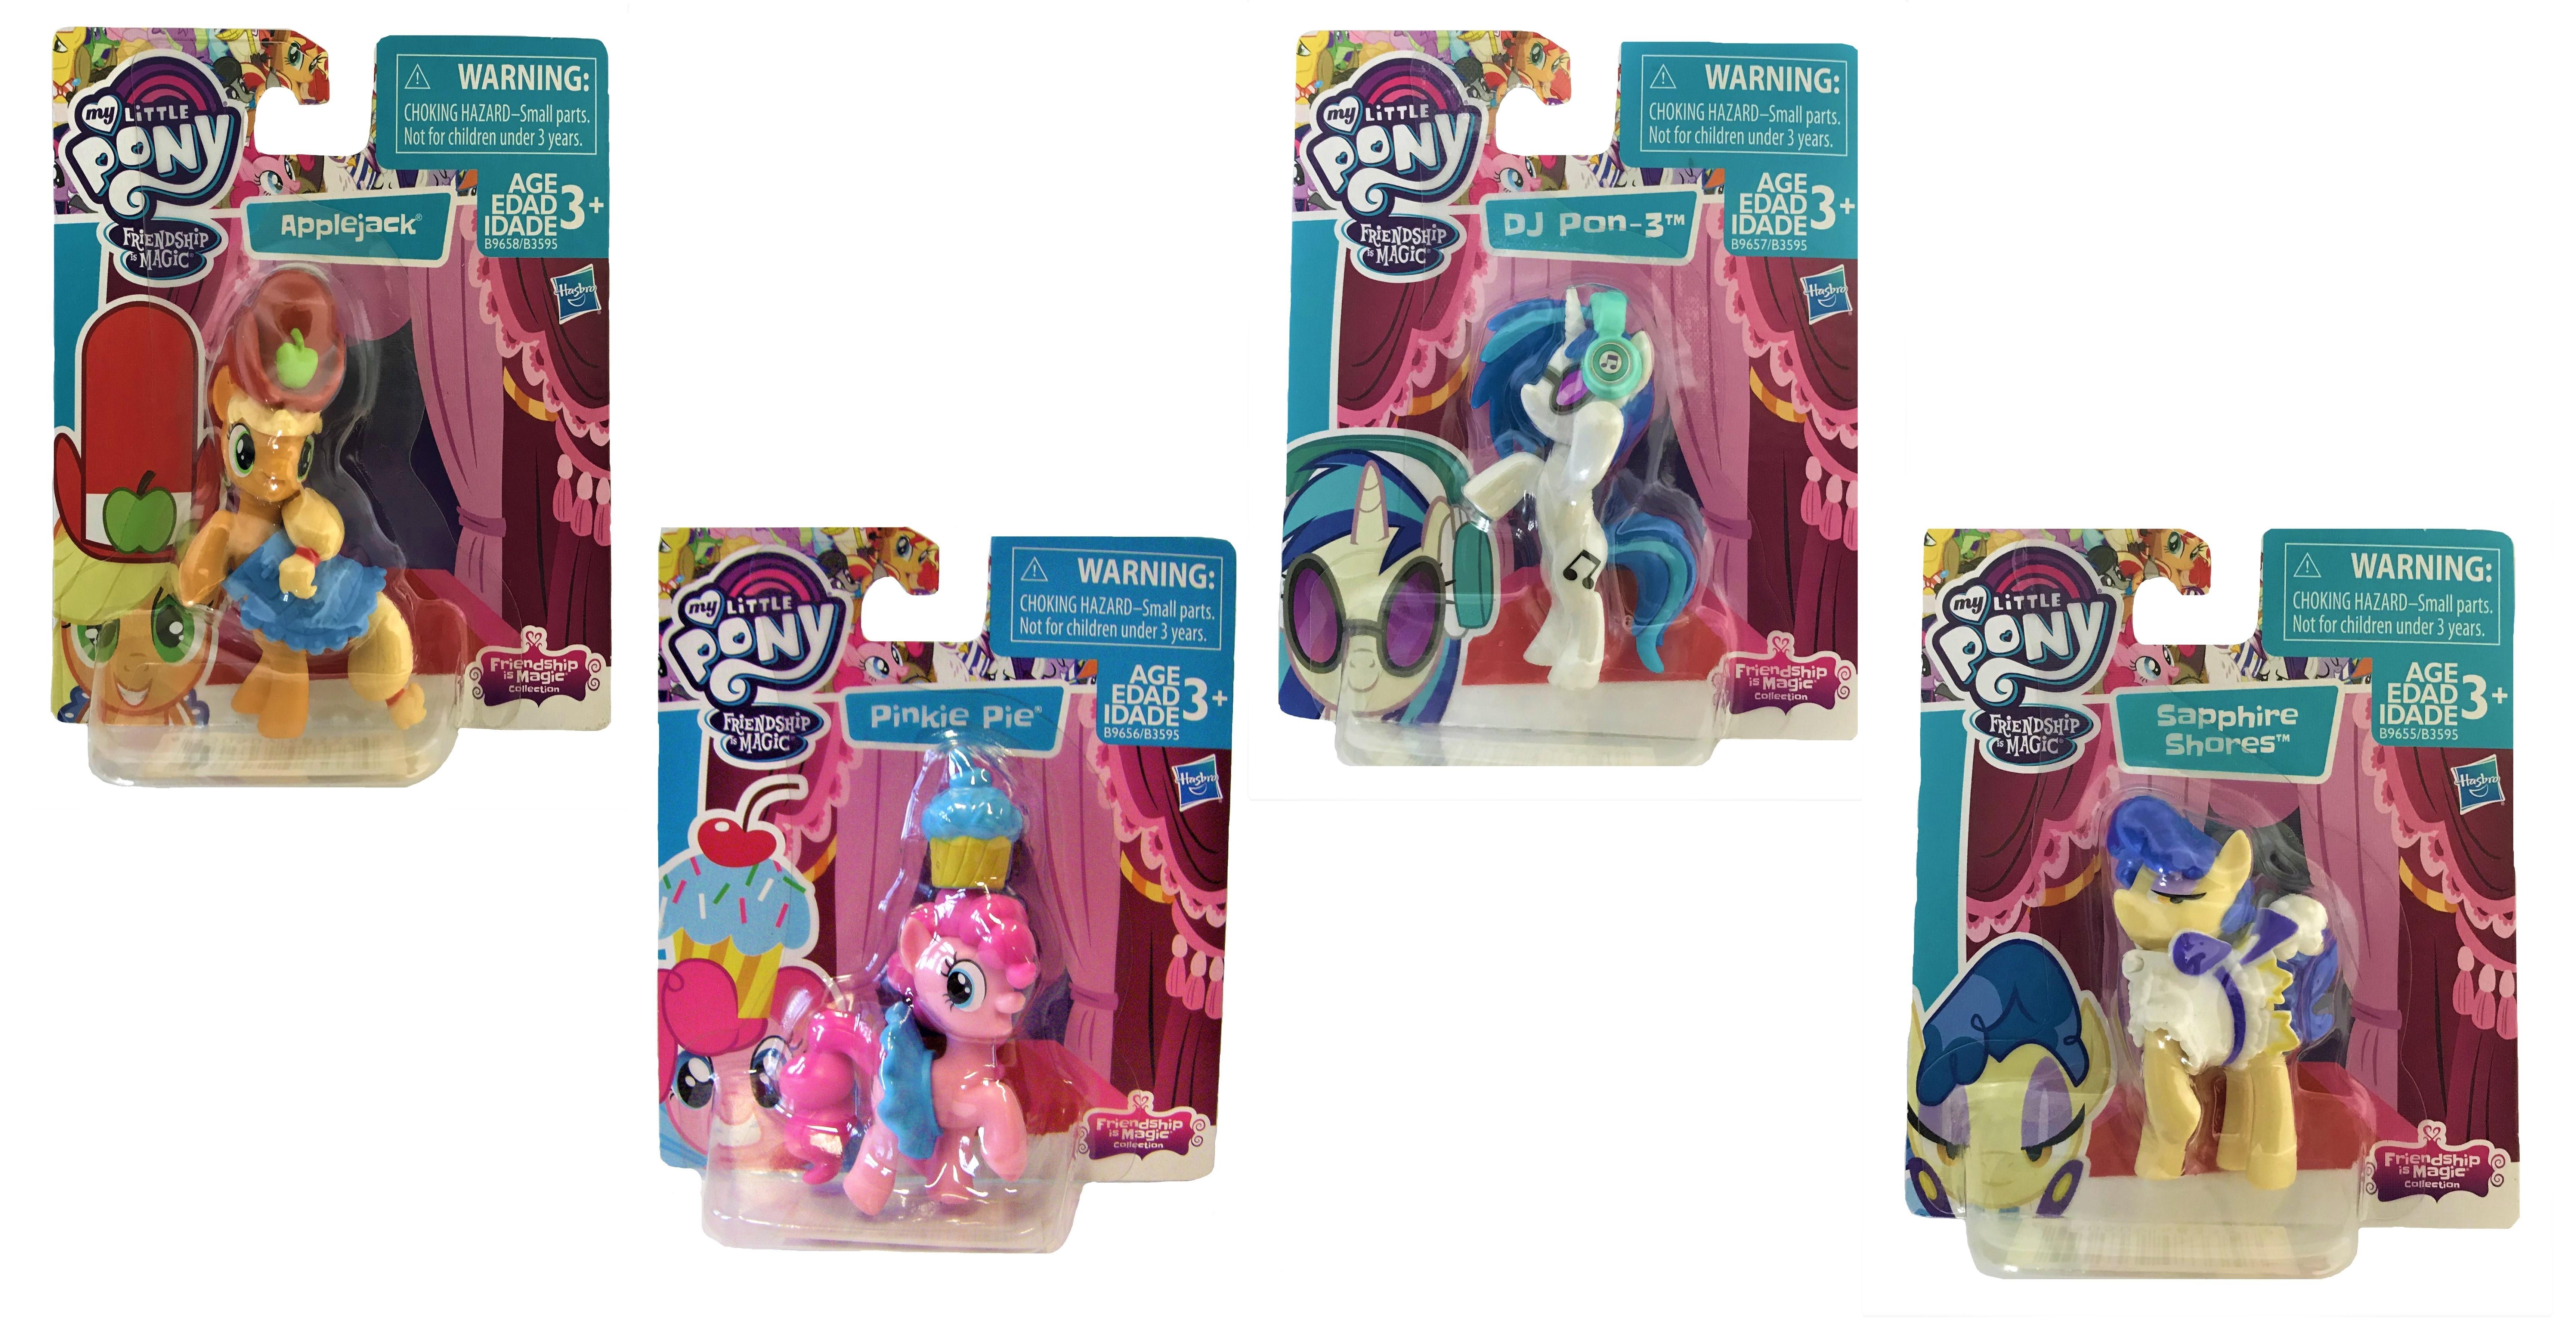 Hasbro My Little Pony Friendship Magic Sammelfiguren 8 cm (Auswahl)